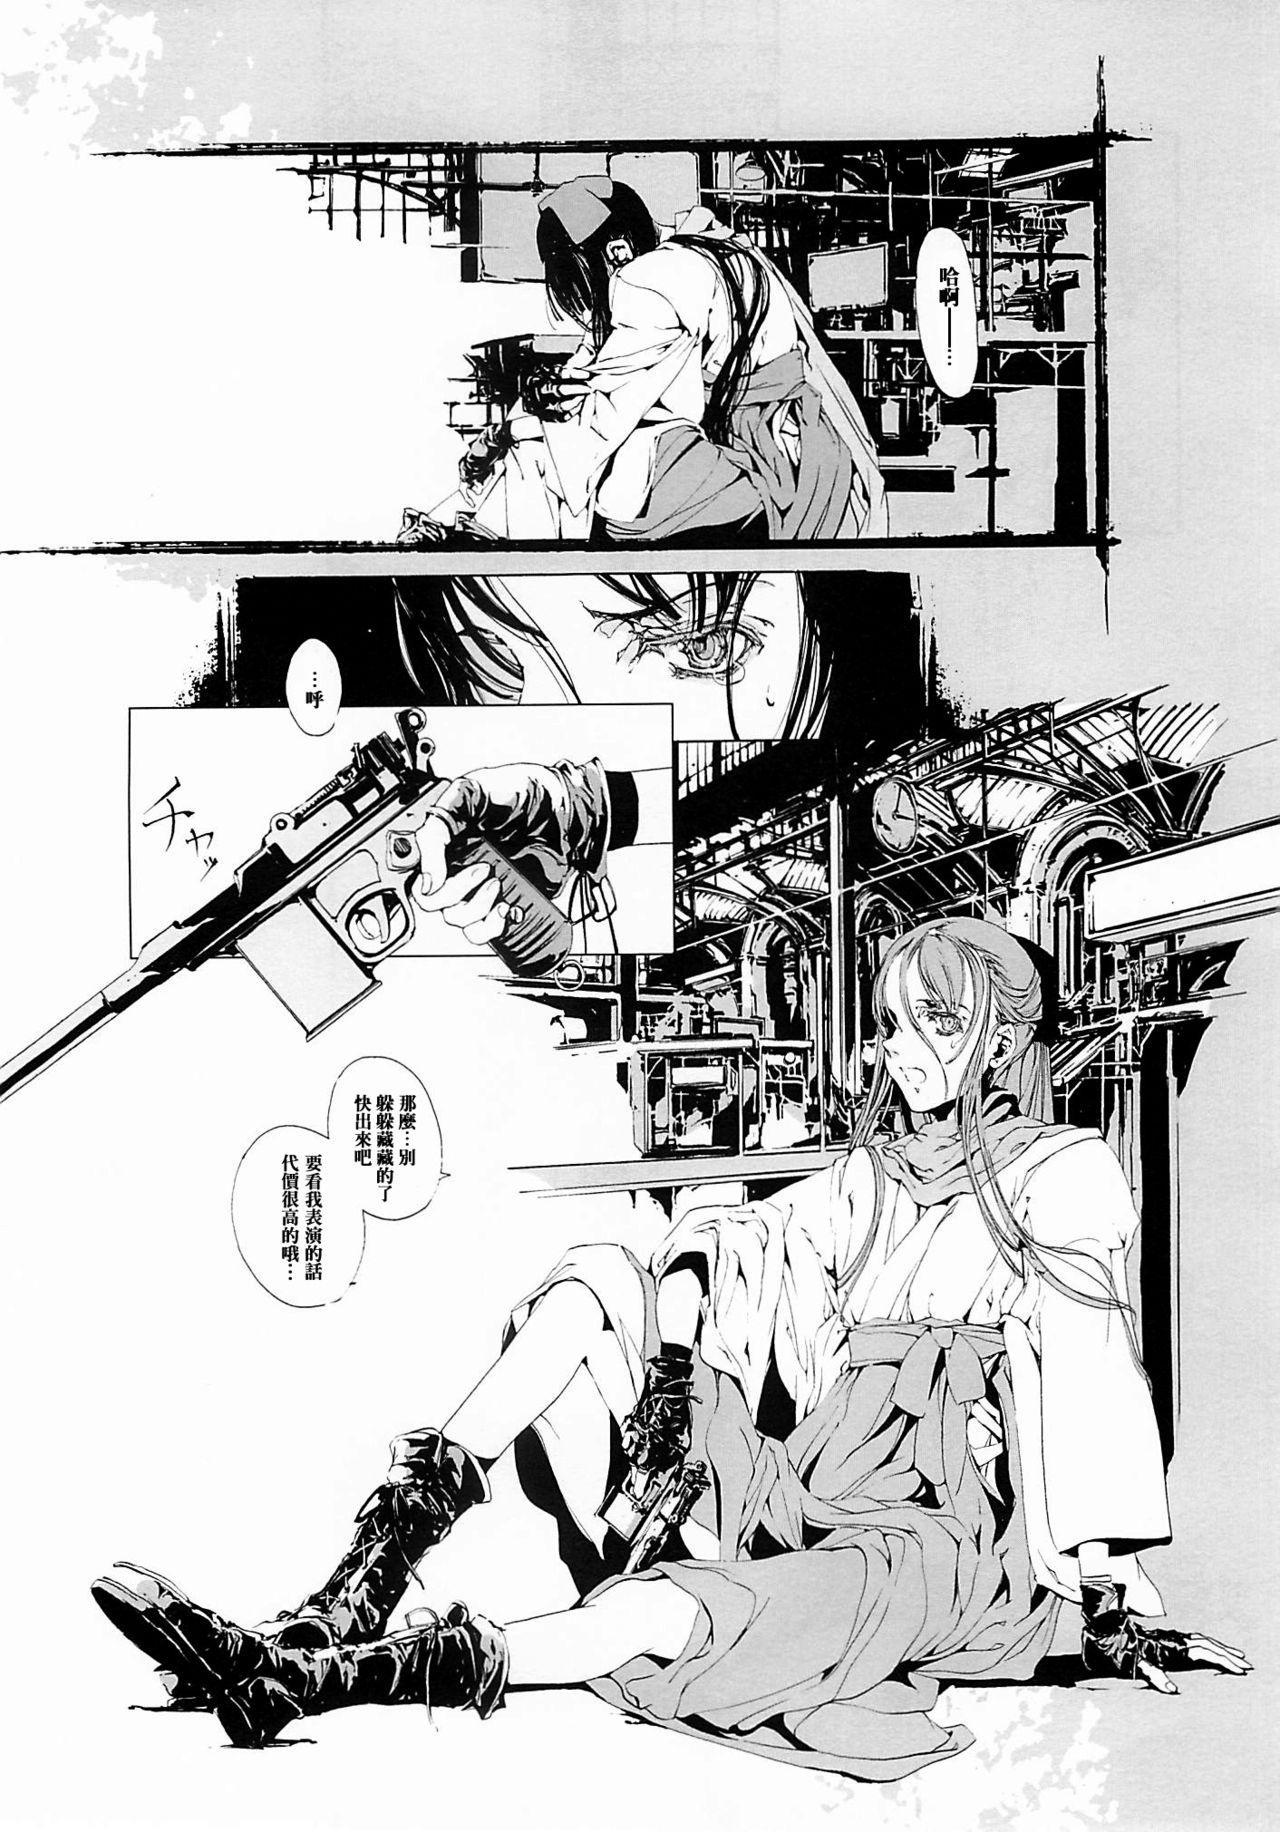 (CR37) [70 Nenshiki Yuukyuu Kikan (Endou Okito)] ORGAN-Tino  01-02[Chinese] [拾荒者汉化组] [Incomplete] 45